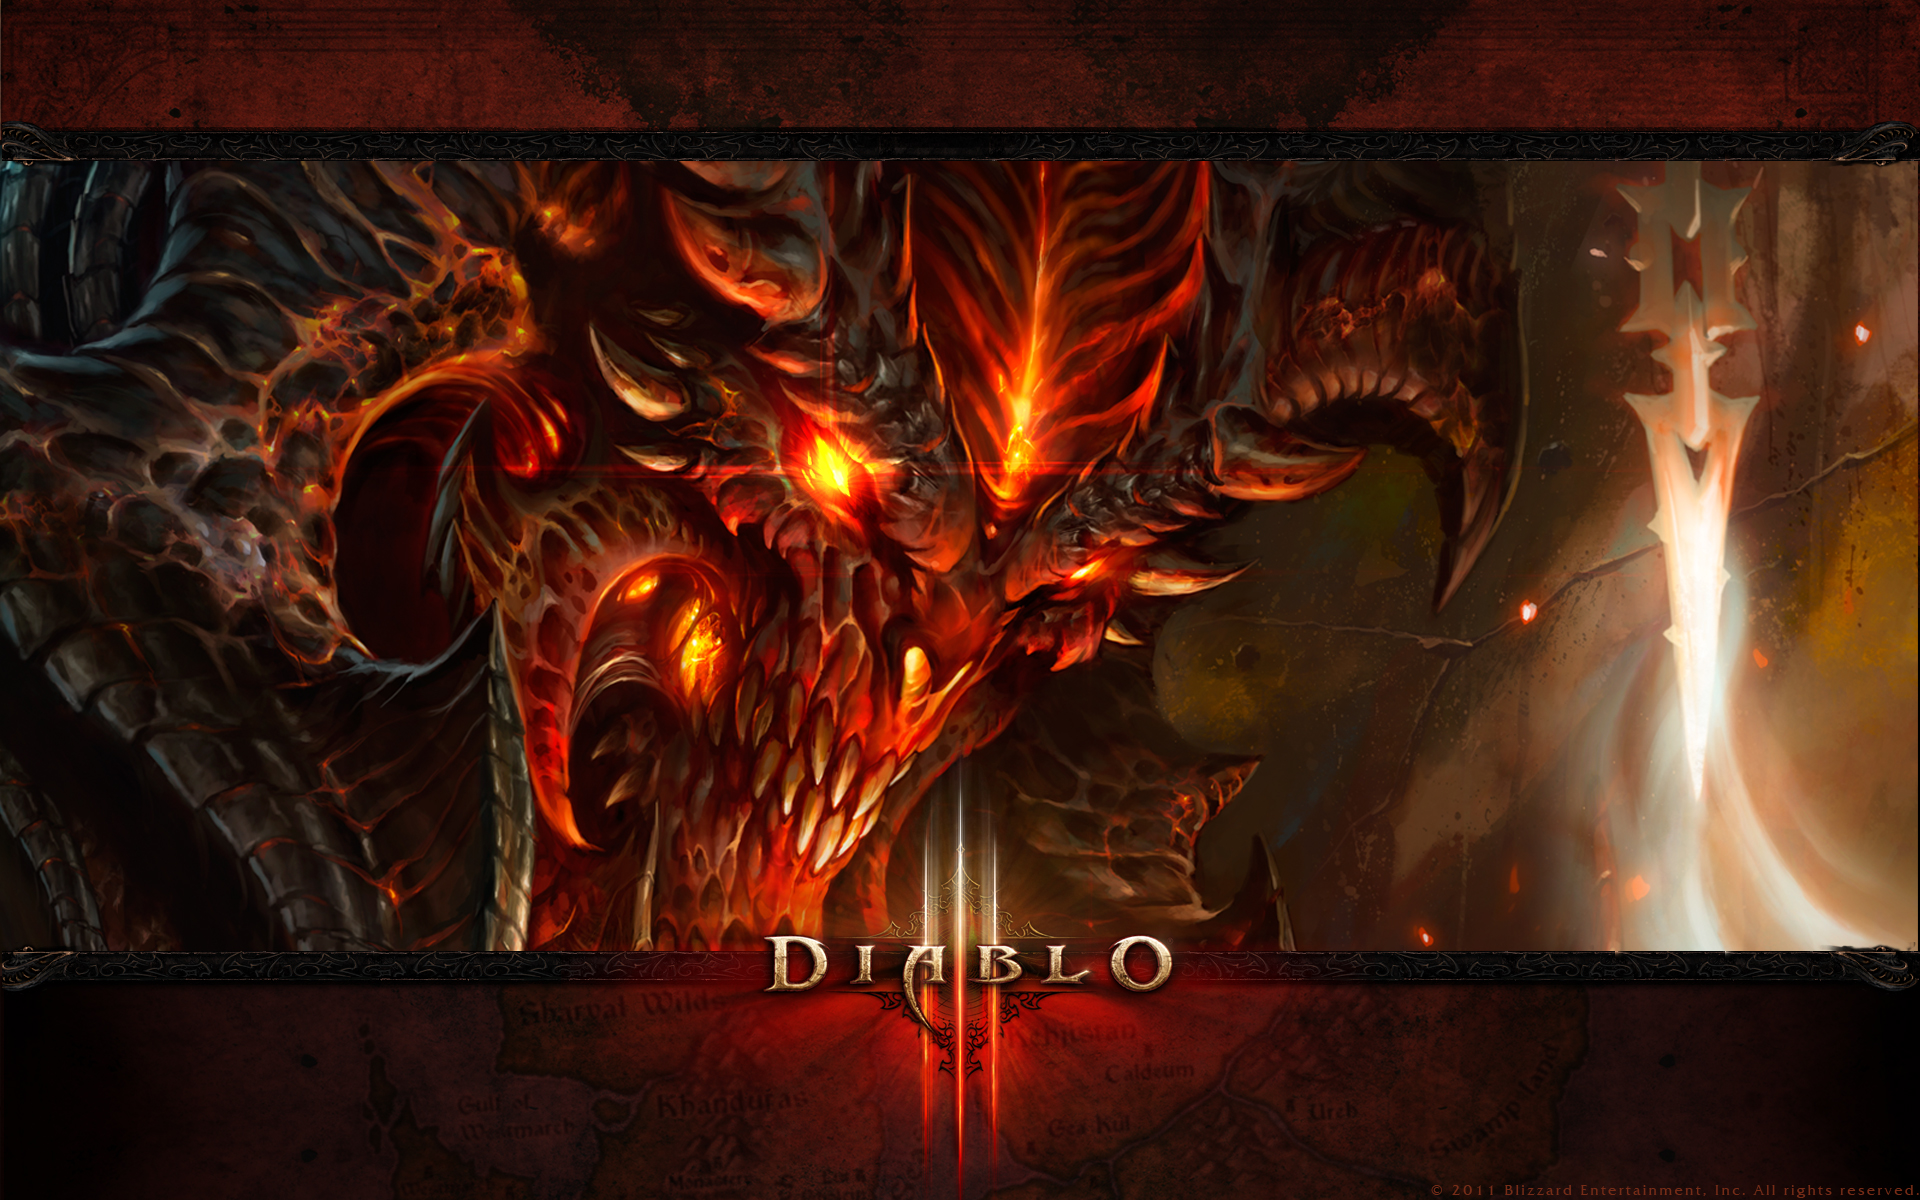 download diablo iii demon wallpaper free latest version